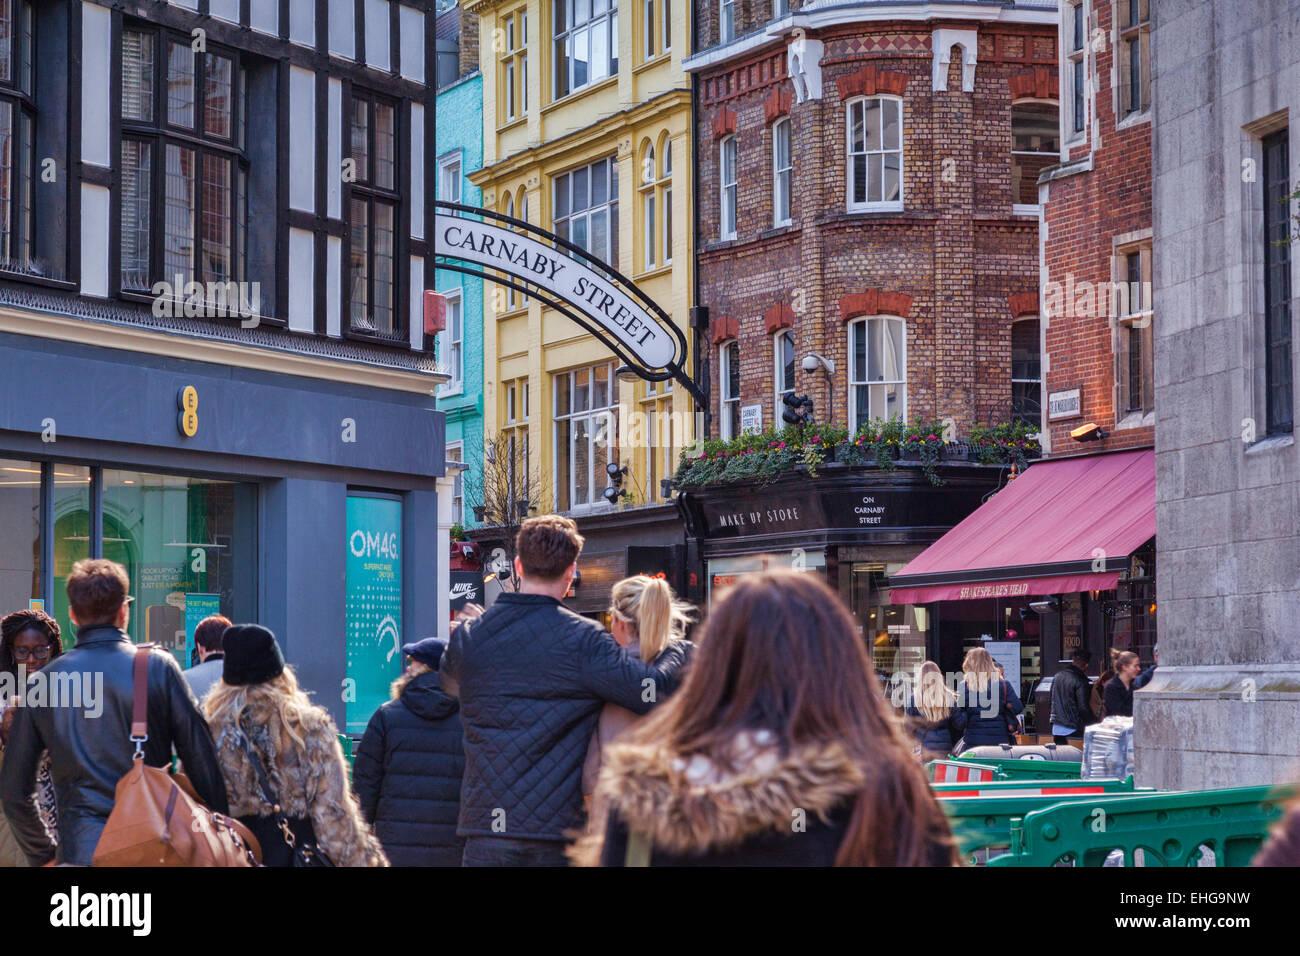 La folla voce in Carnaby Street a Londra, Inghilterra. Immagini Stock